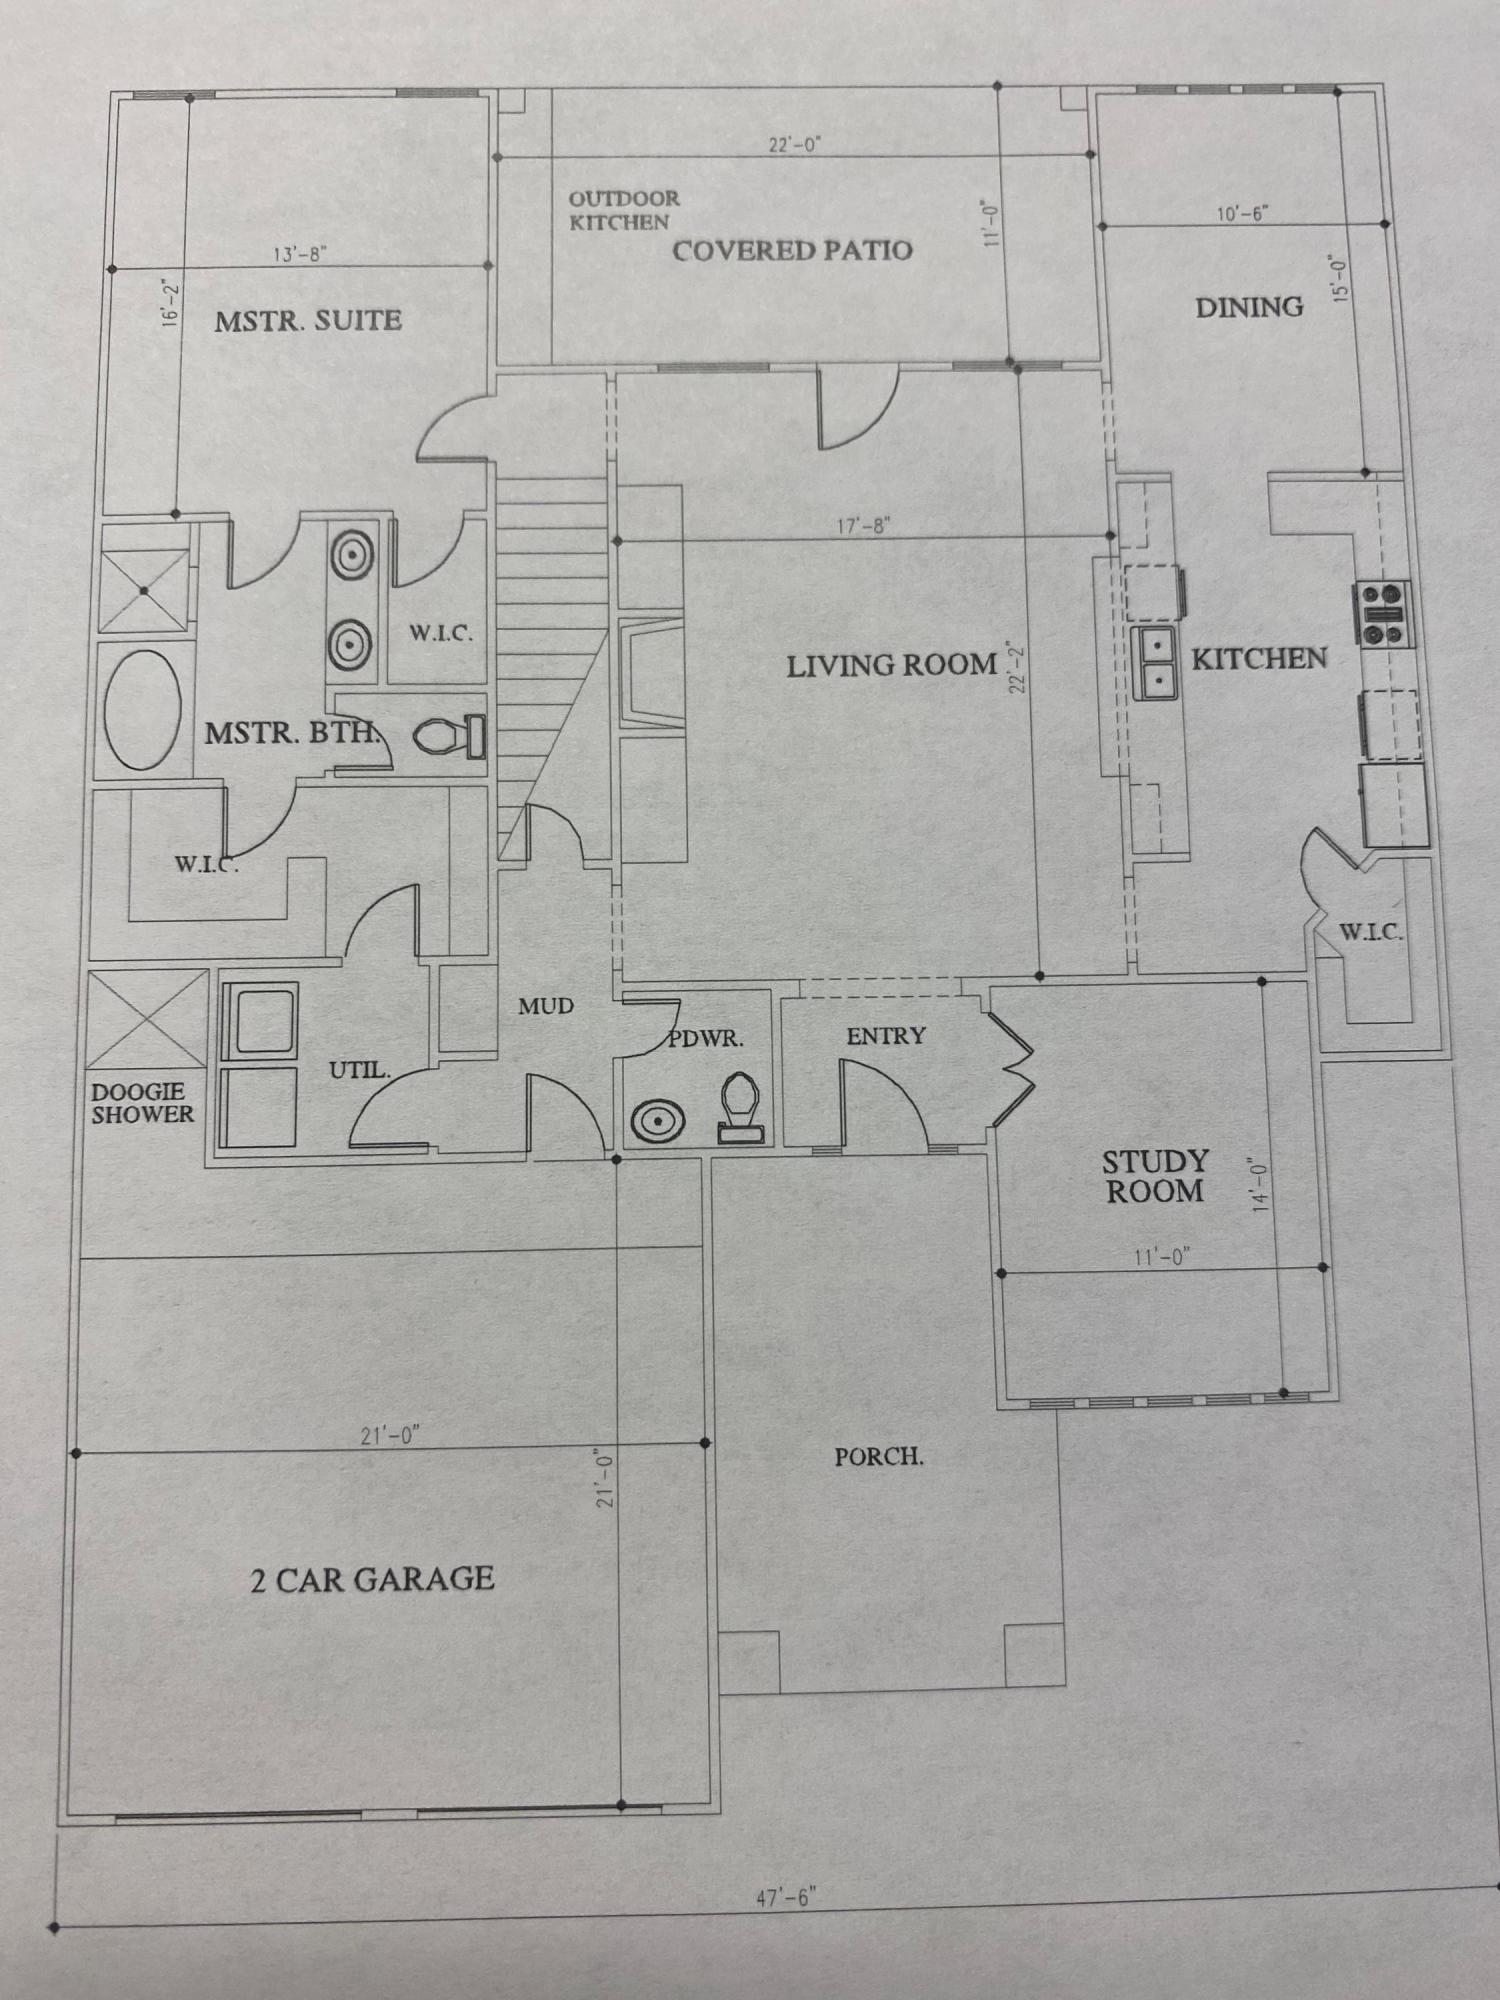 Davalissa - 1st level floor plan